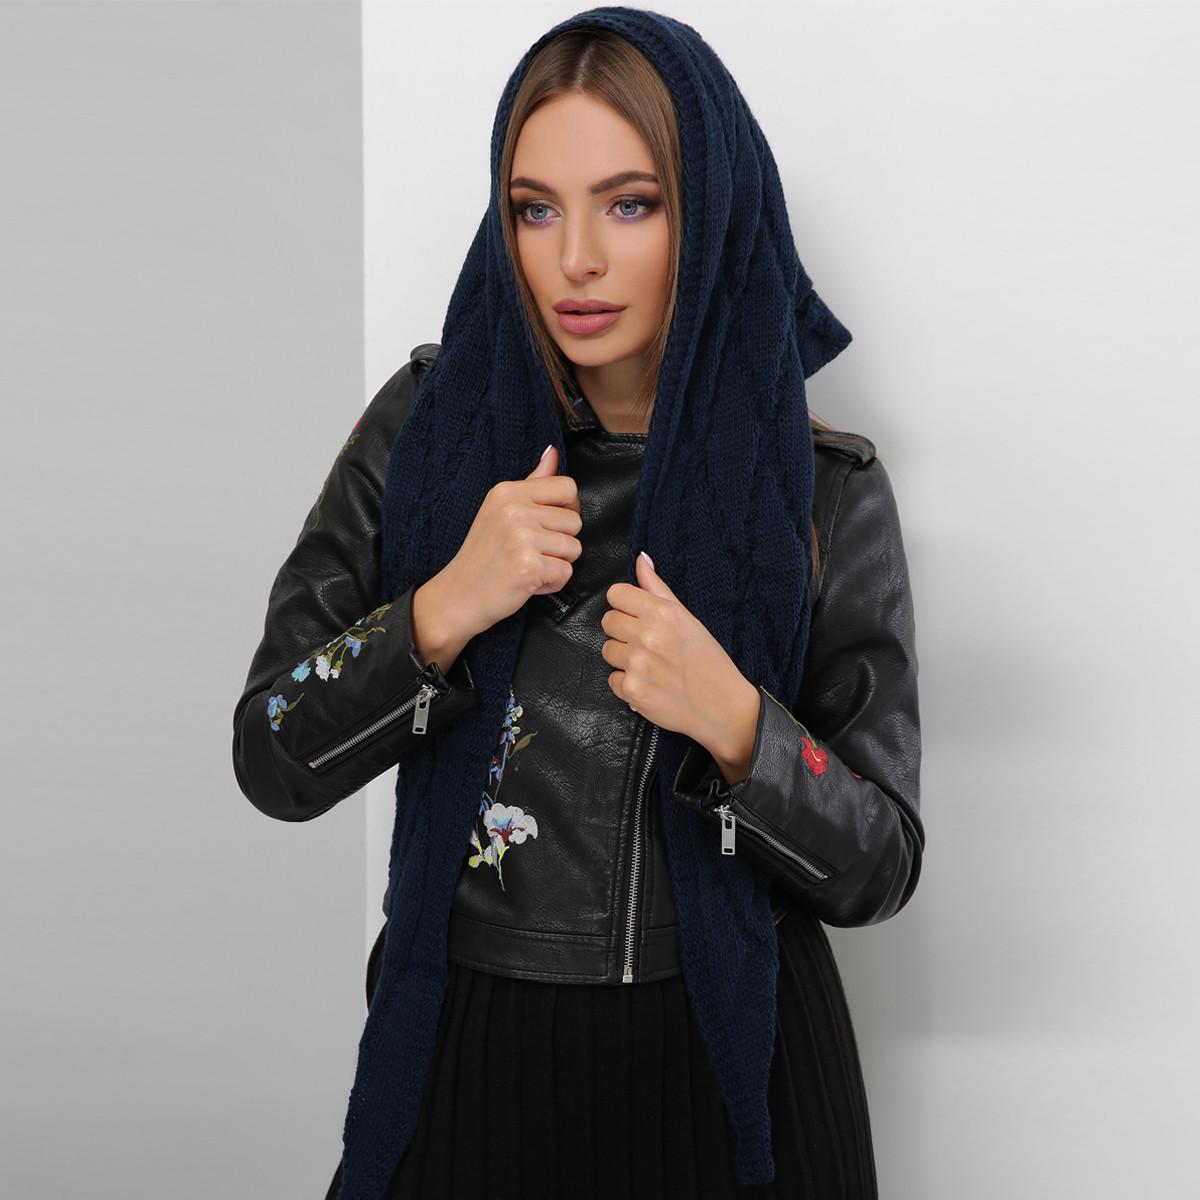 Синий женский платок вязаный теплый